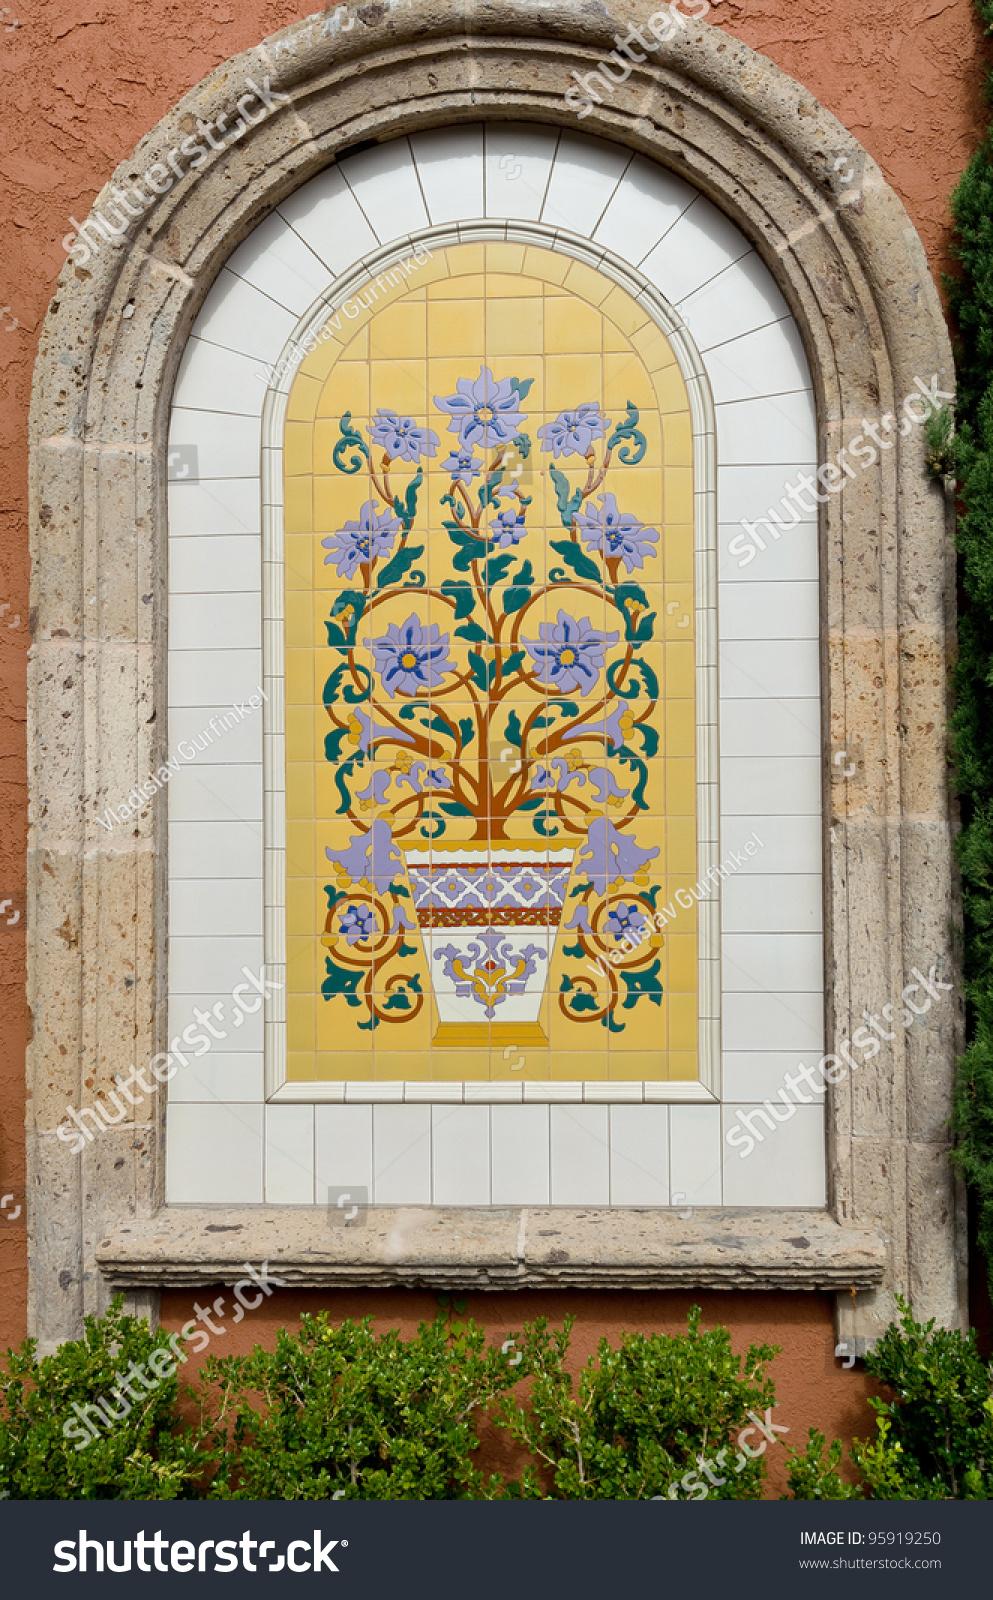 Modern Spanish Wrought Iron Wall Decor Sketch - The Wall Art ...